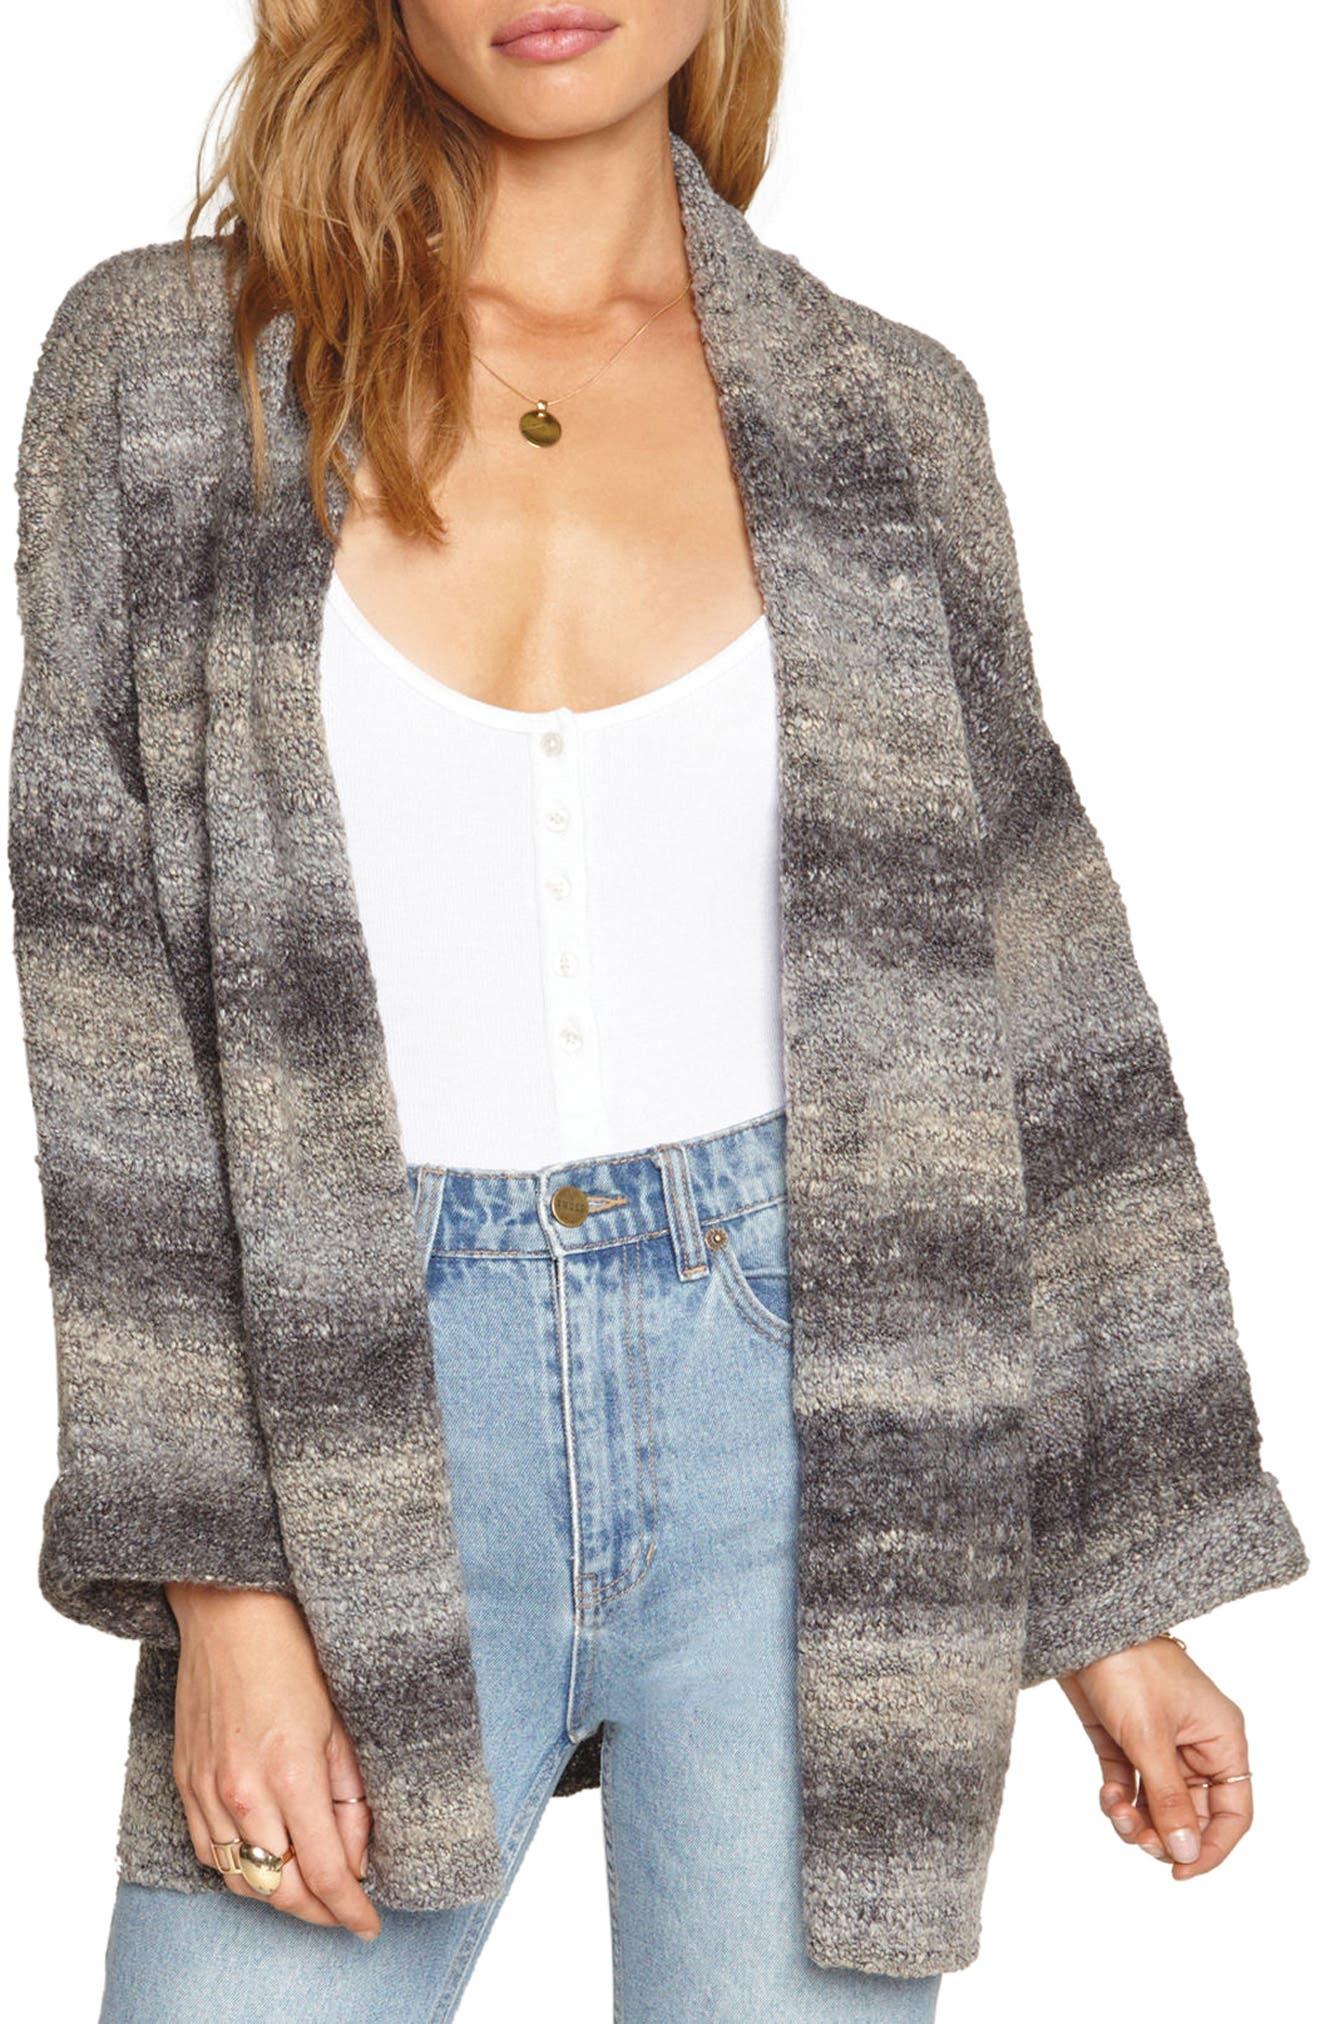 Beckett Stripe Sweater,                             Main thumbnail 1, color,                             020